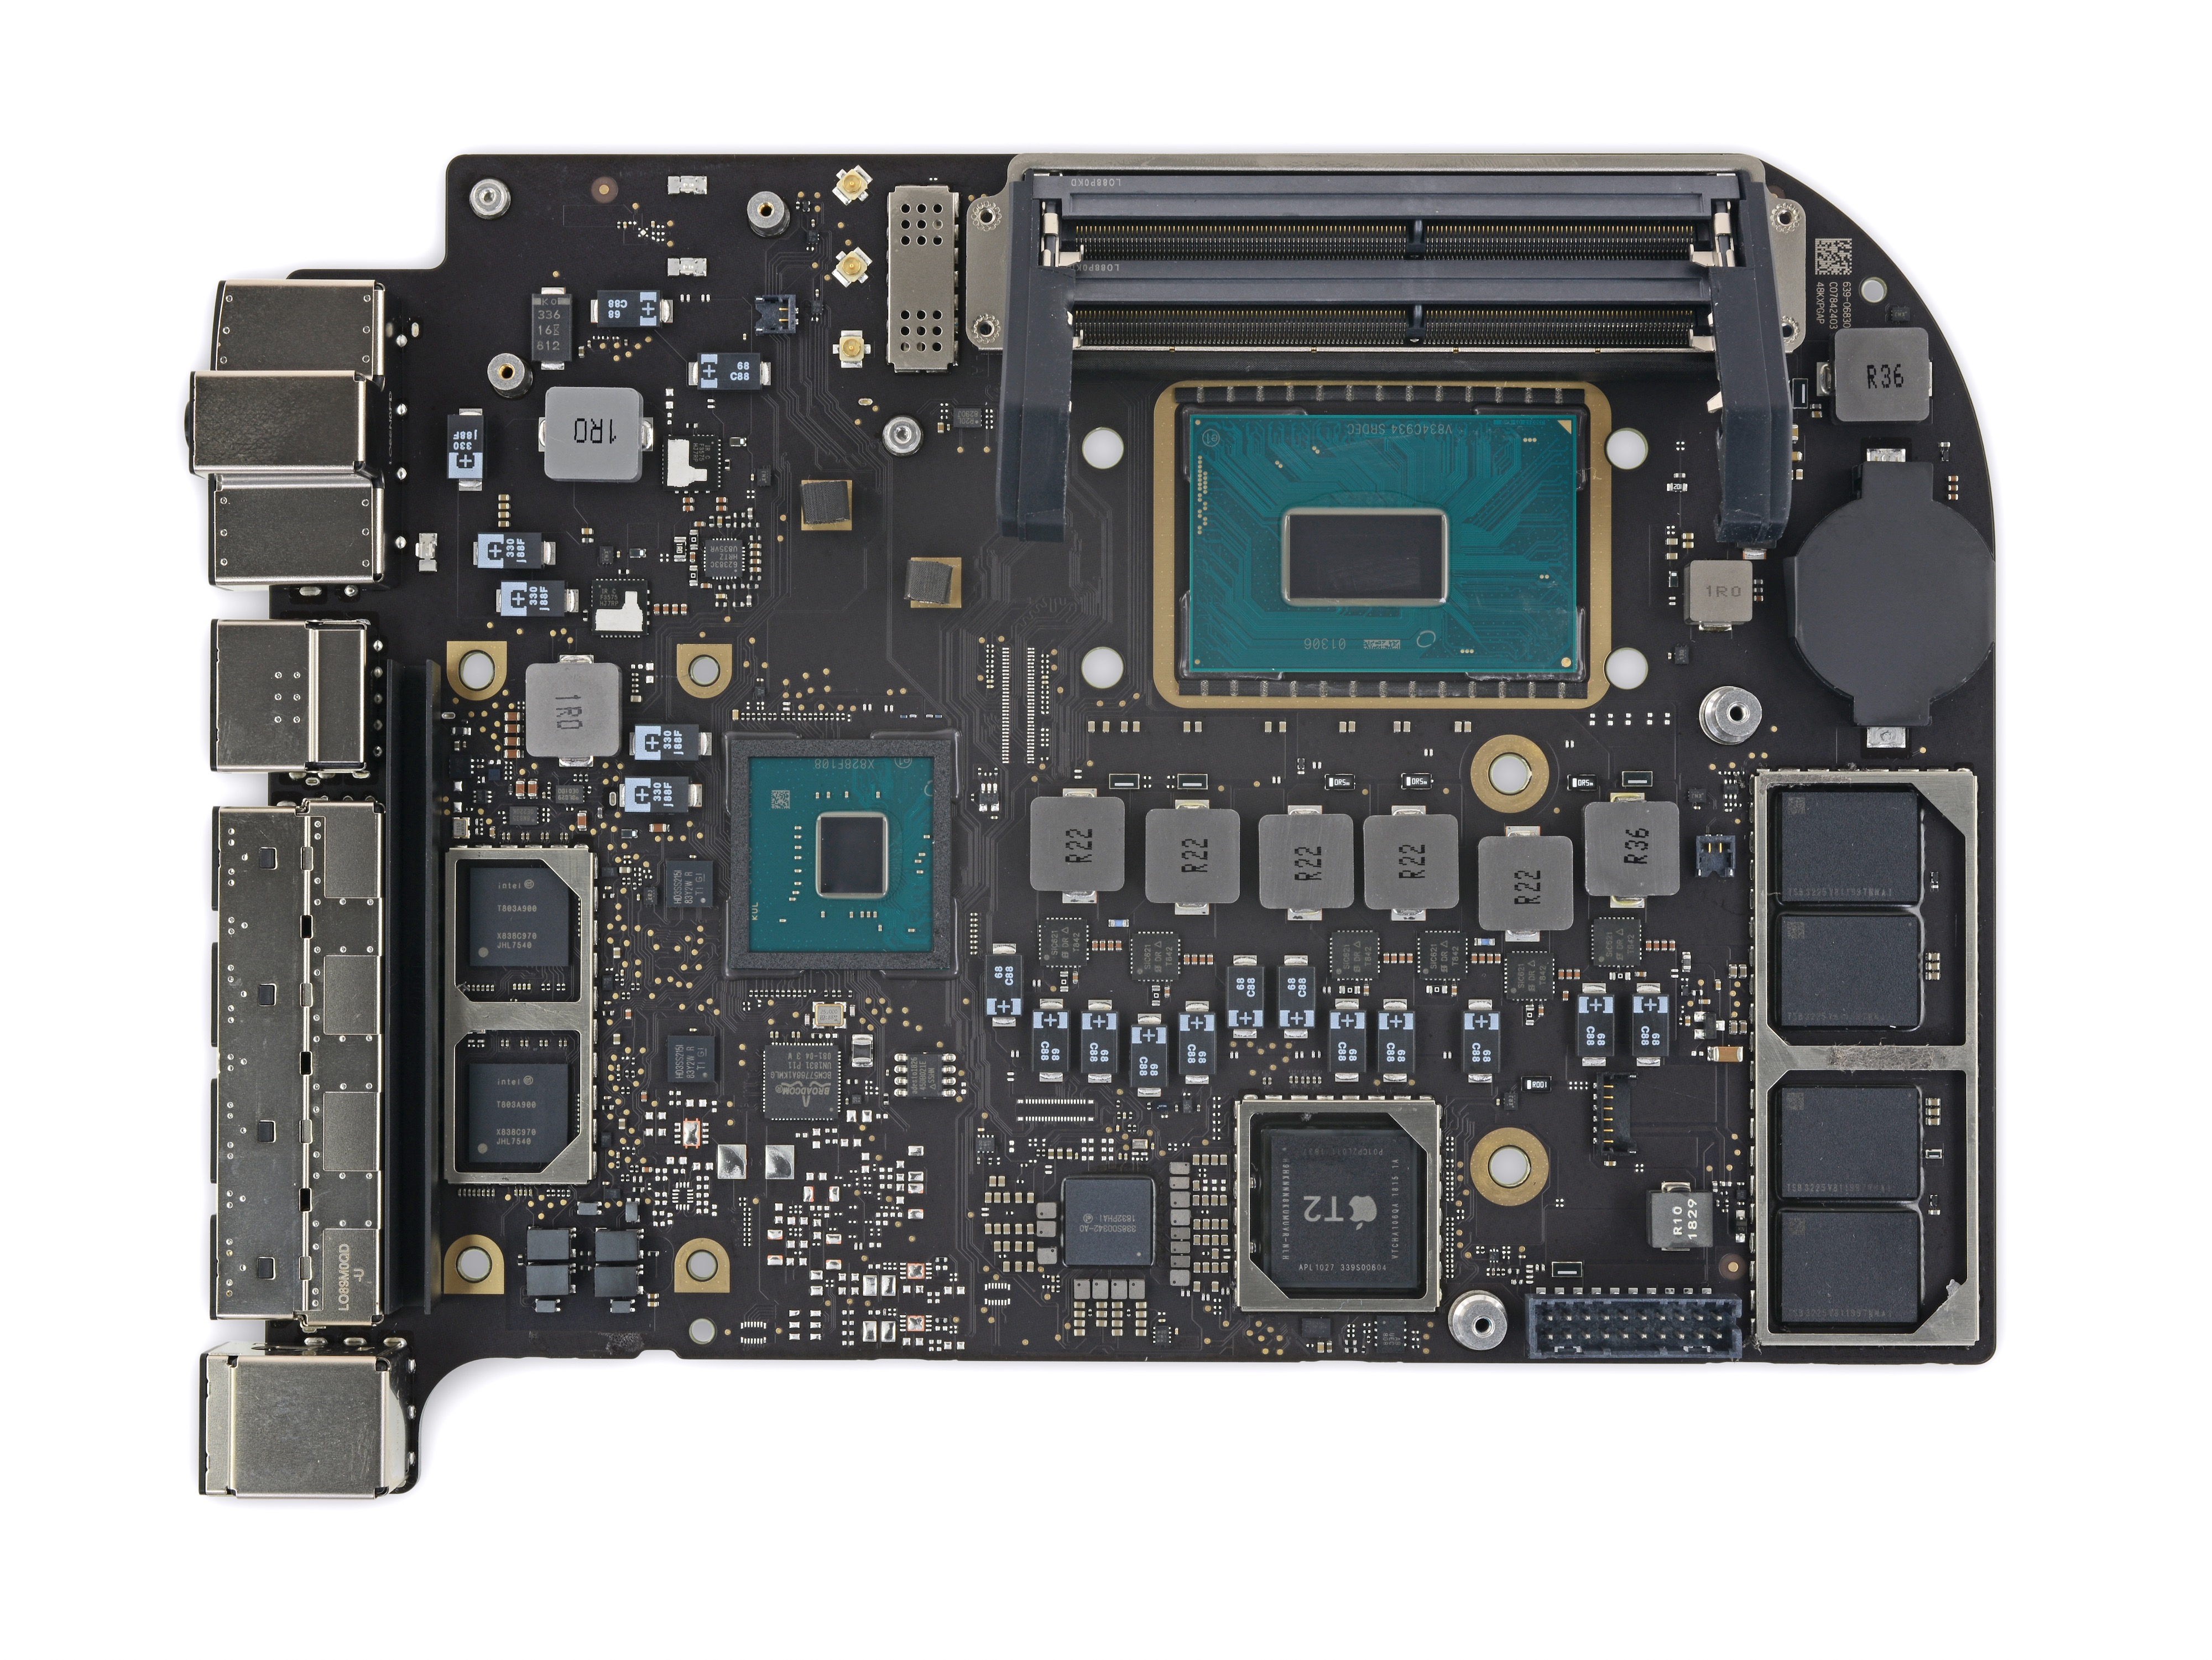 Desmonte do novo Mac mini pela iFixit